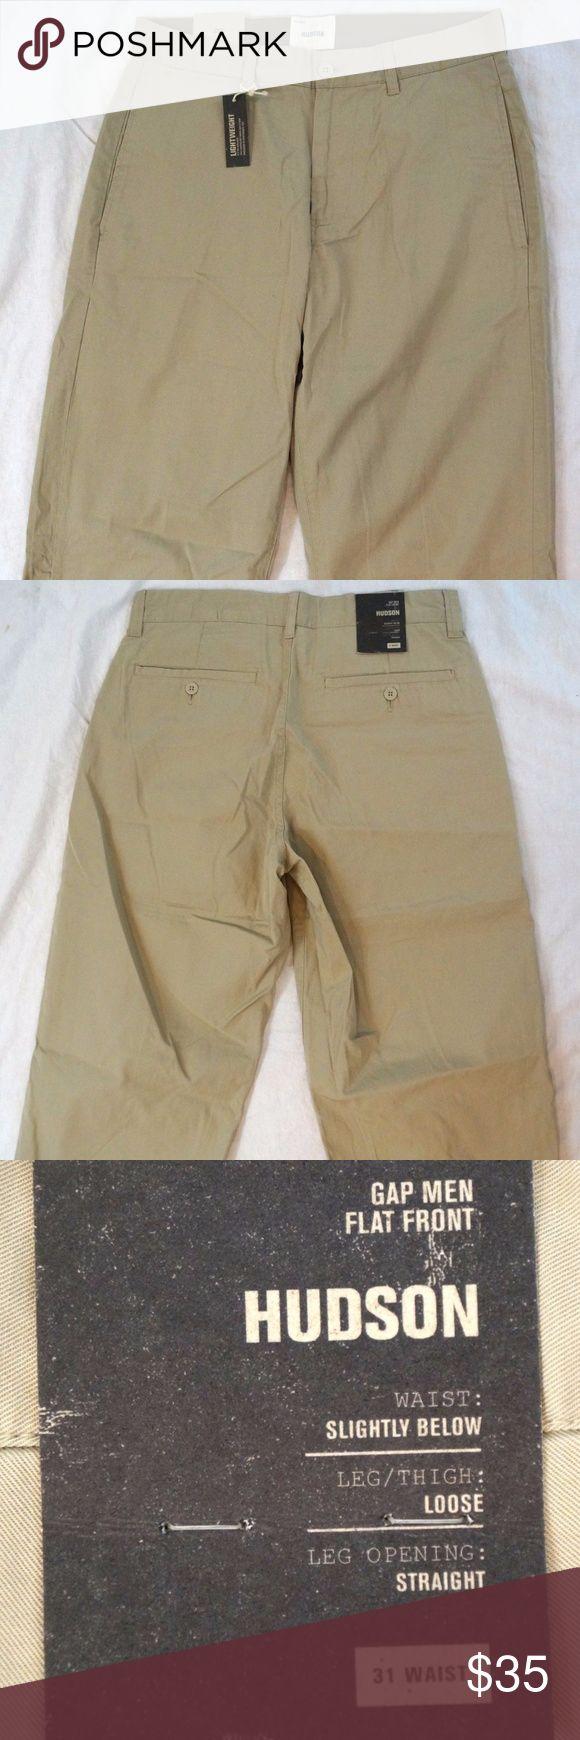 "Gap Hudson Loose Fit Flat Front Mens Khaki Shorts Gap Hudson Loose Fit Flat Front Mens Khaki Shorts Size 31 NWT   Hand Measurements: Waist: 31"" Inseam: 20"" Rise: 11"" Thigh: 26"" Leg Opening: 10""  PM#2410 GAP Shorts Flat Front"